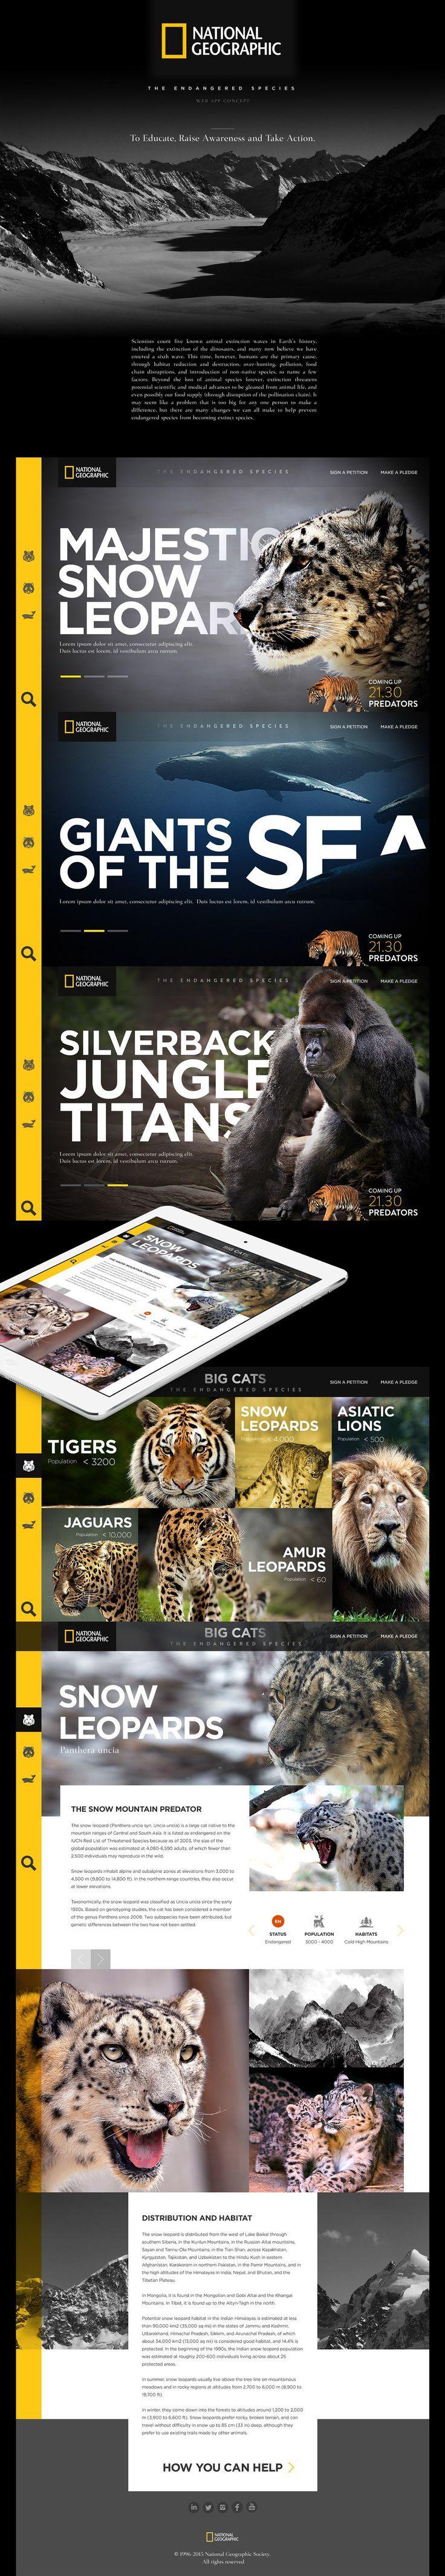 Inspiration | Five Star Branding Agency | Fivestar Design and Website Branding | Page 2